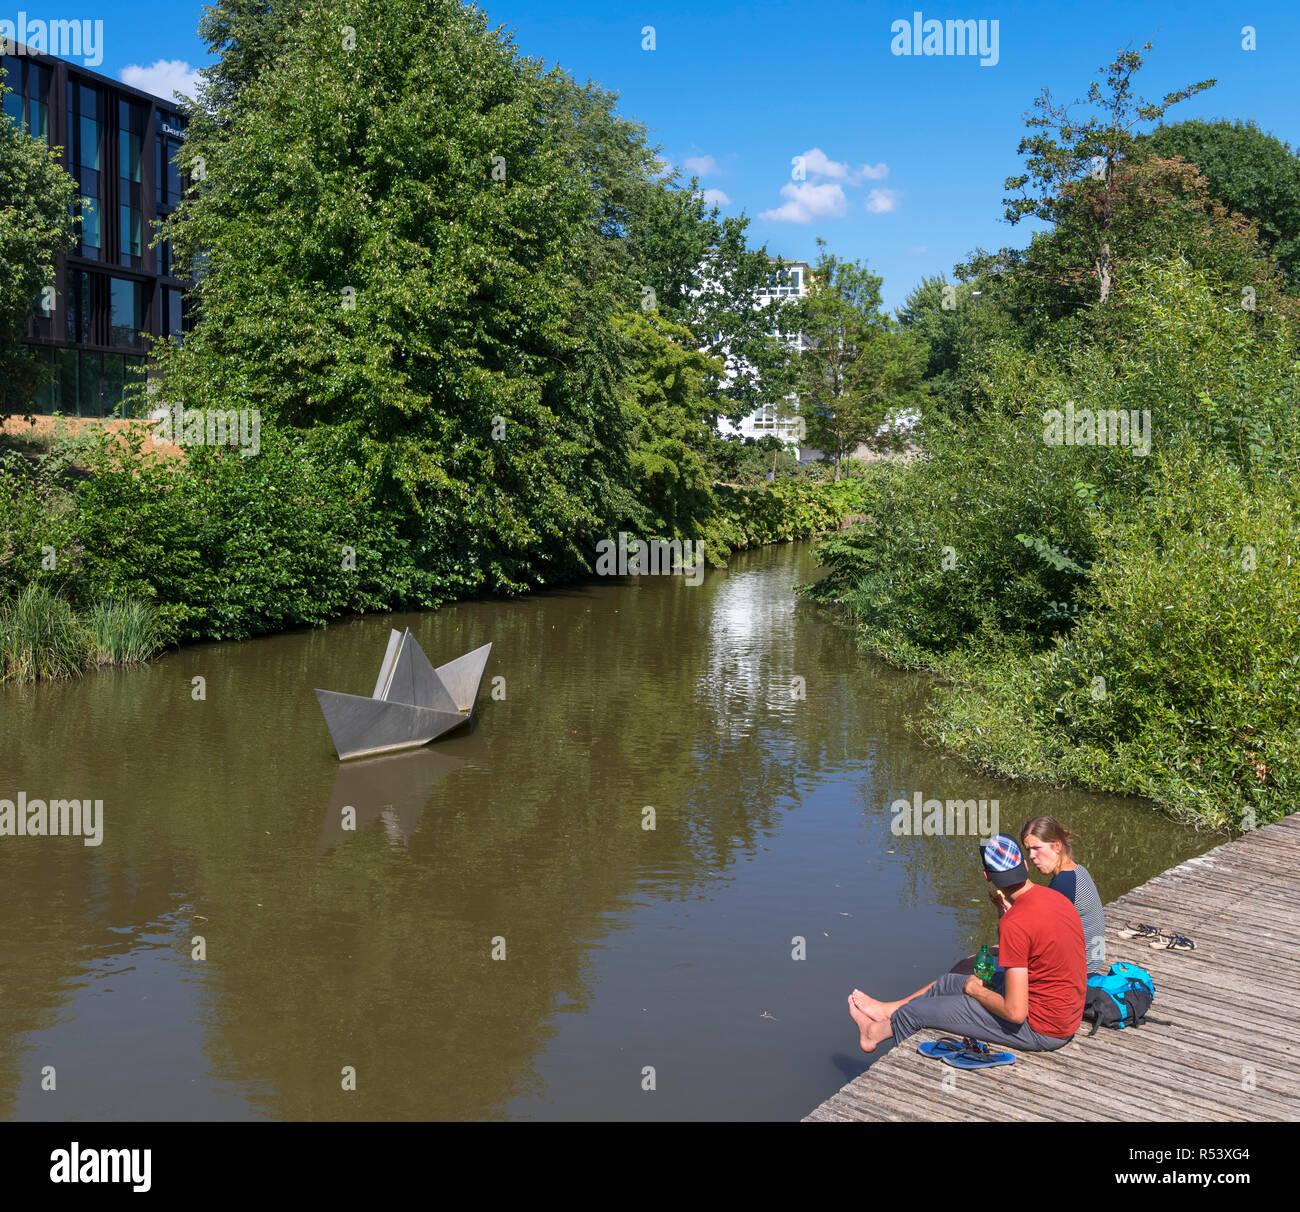 "Couple sitting on the waterfront with Erik Heide's sculpture ""Paper Boat"" behind, Hans Christian Andersen Garden, Odense, Funen, Denmark Stock Photo"